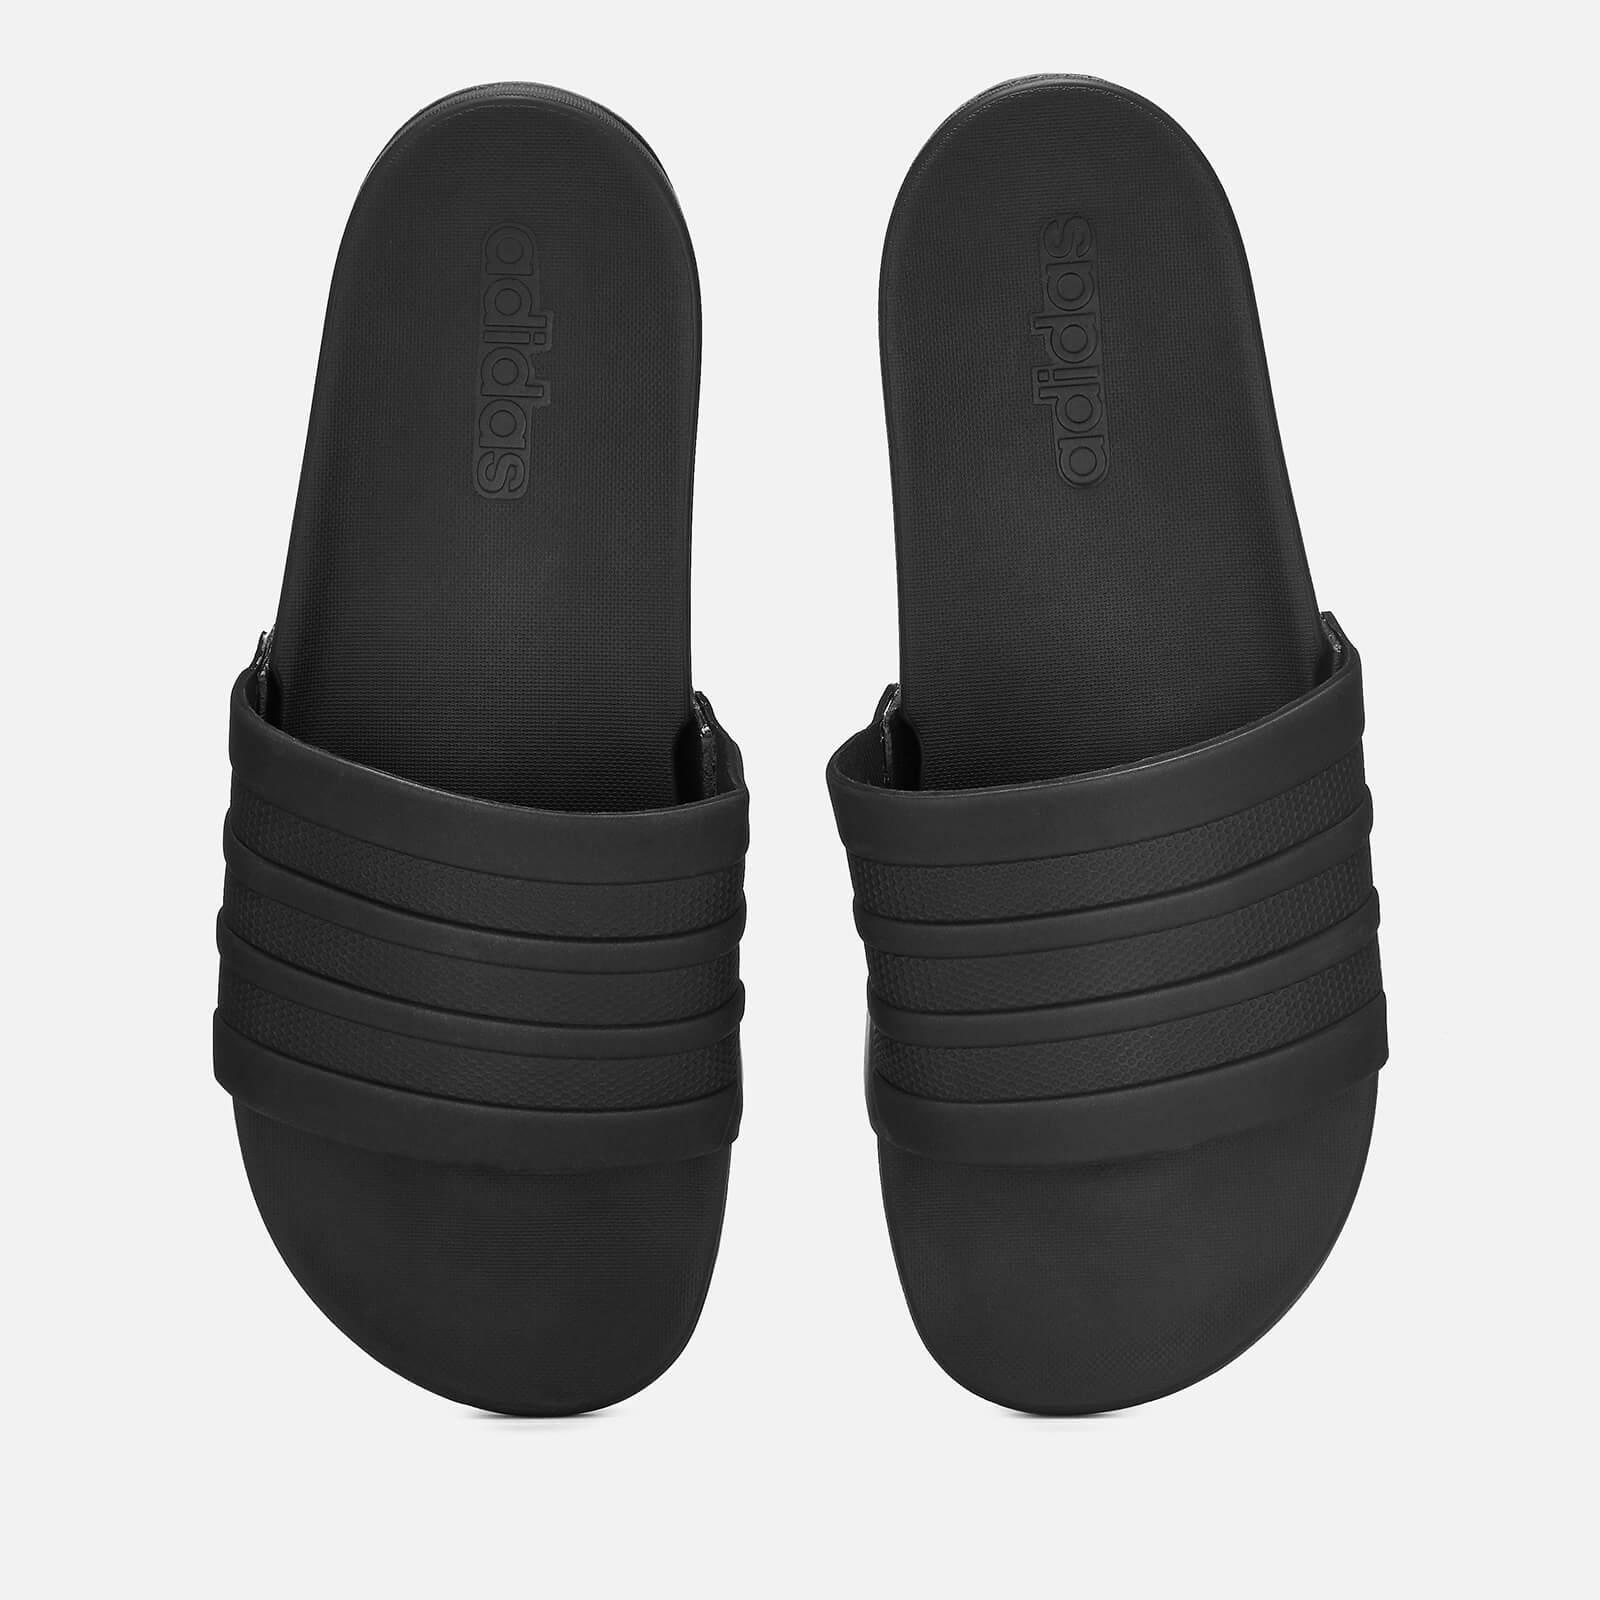 a37ae4801d099 adidas Men's Adilette Comfort Slide Sandals - Black